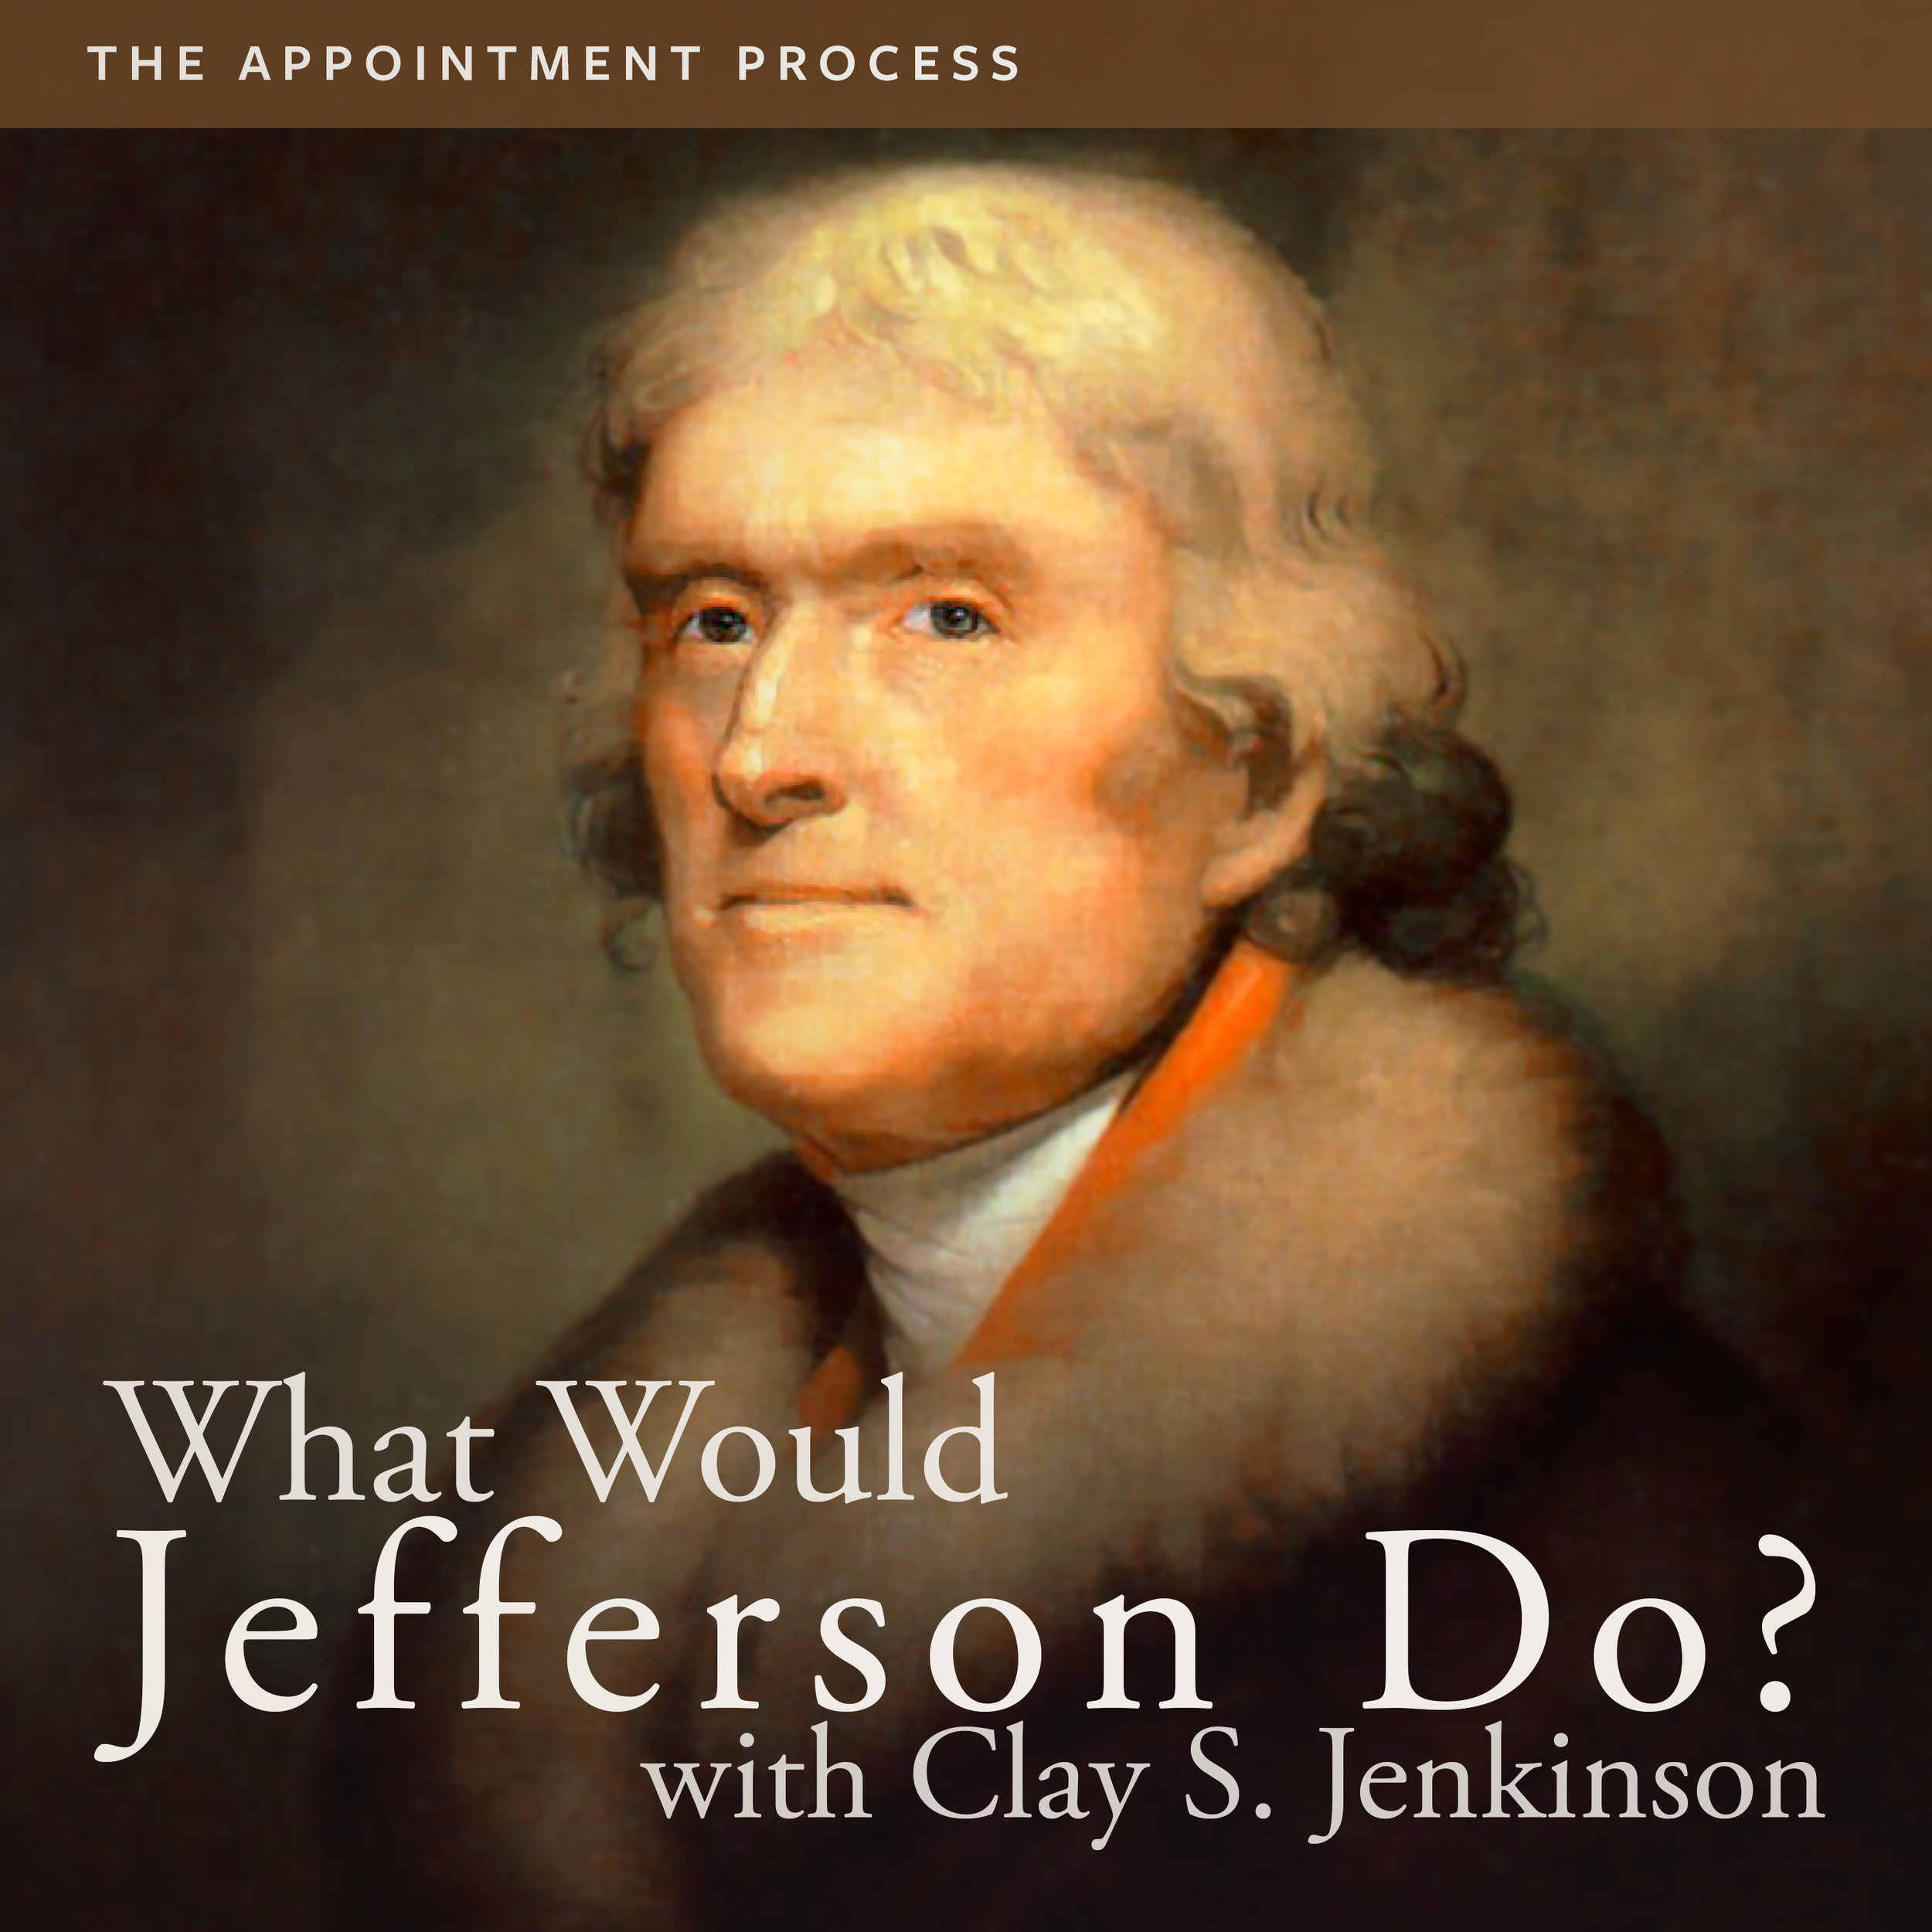 WWTJD_1324 The Appointment Process.jpg